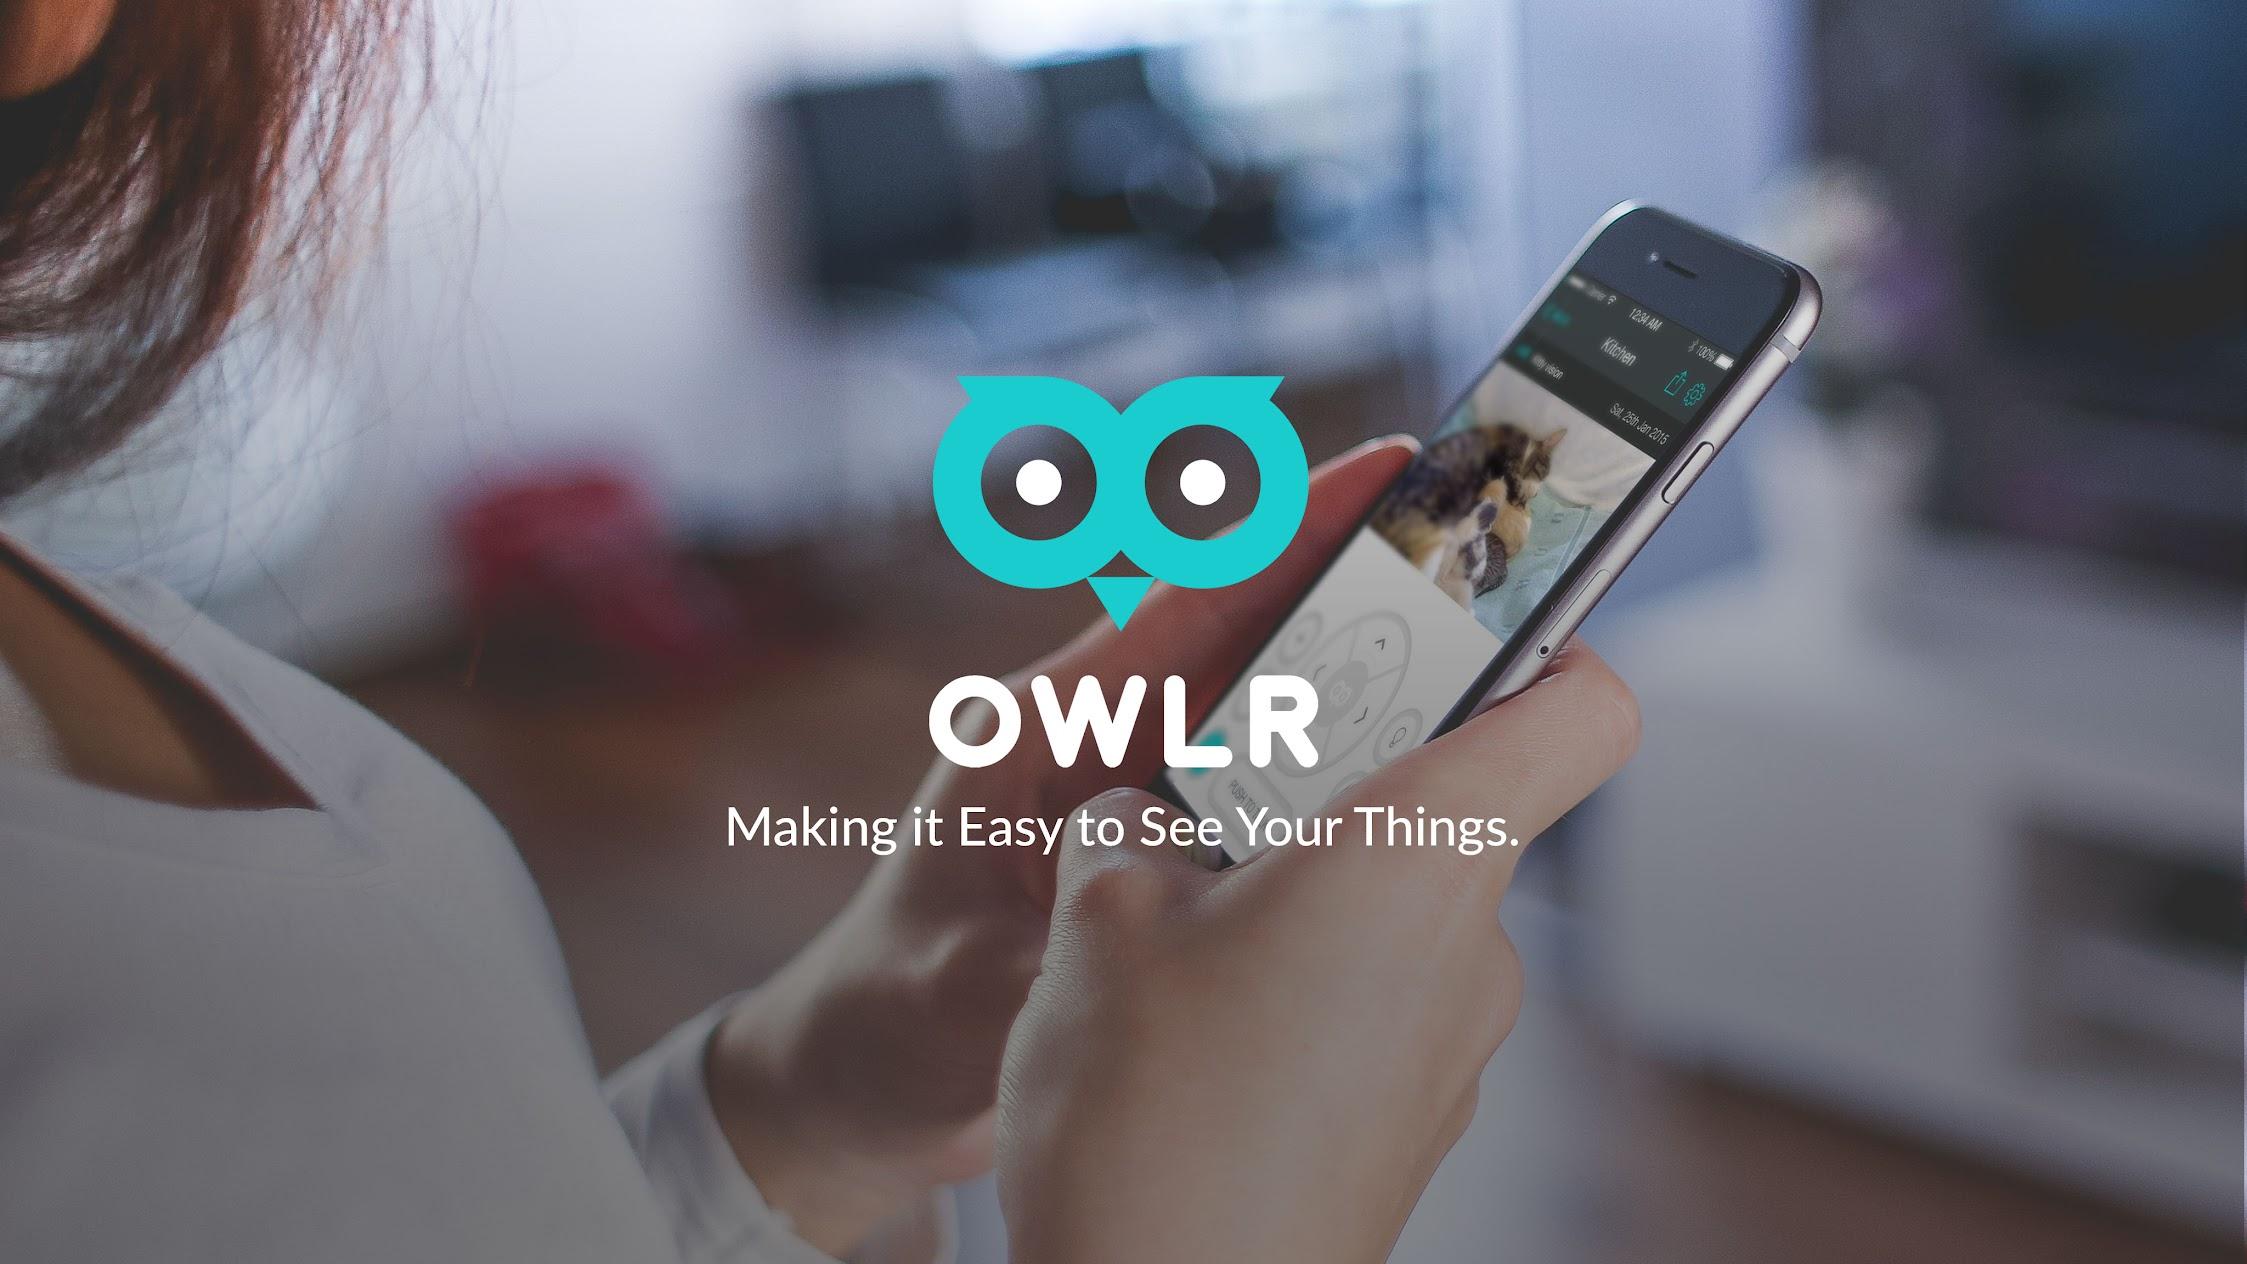 OWLR Technologies